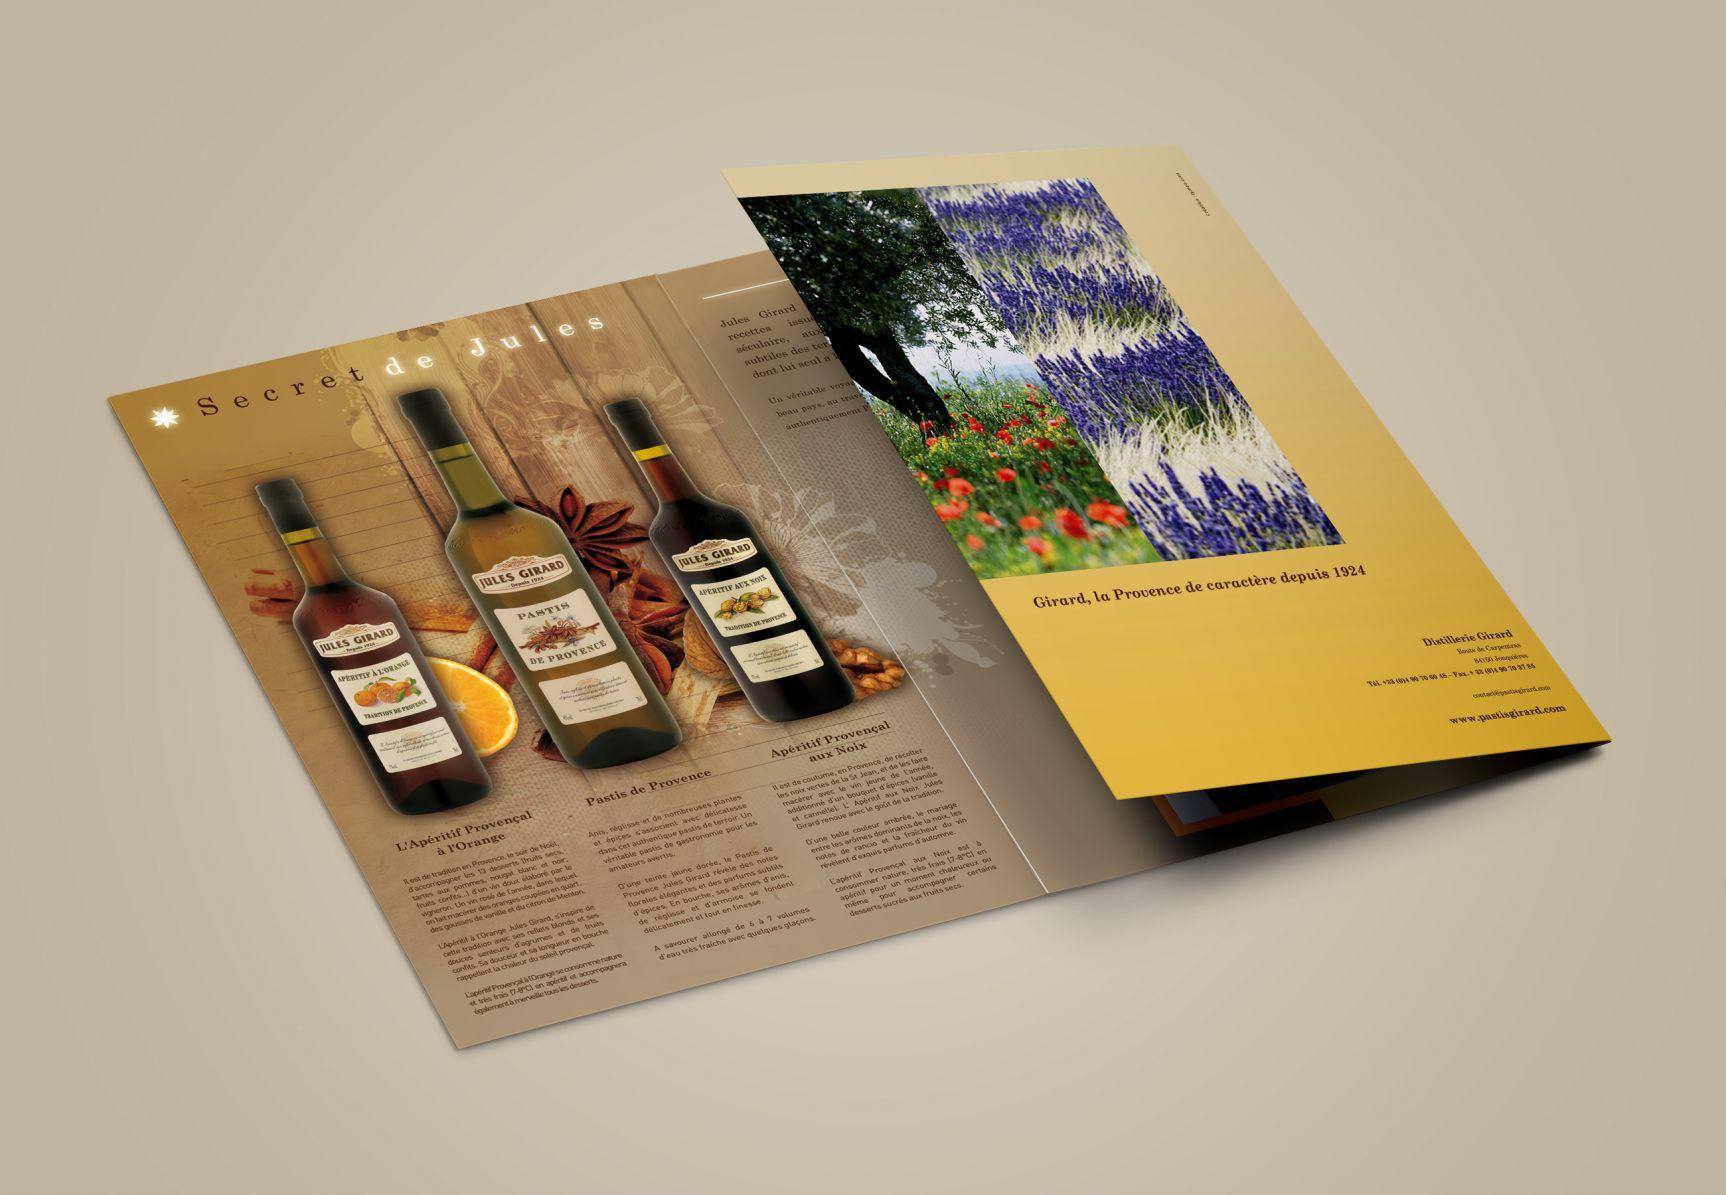 Pastis Girard Brochure